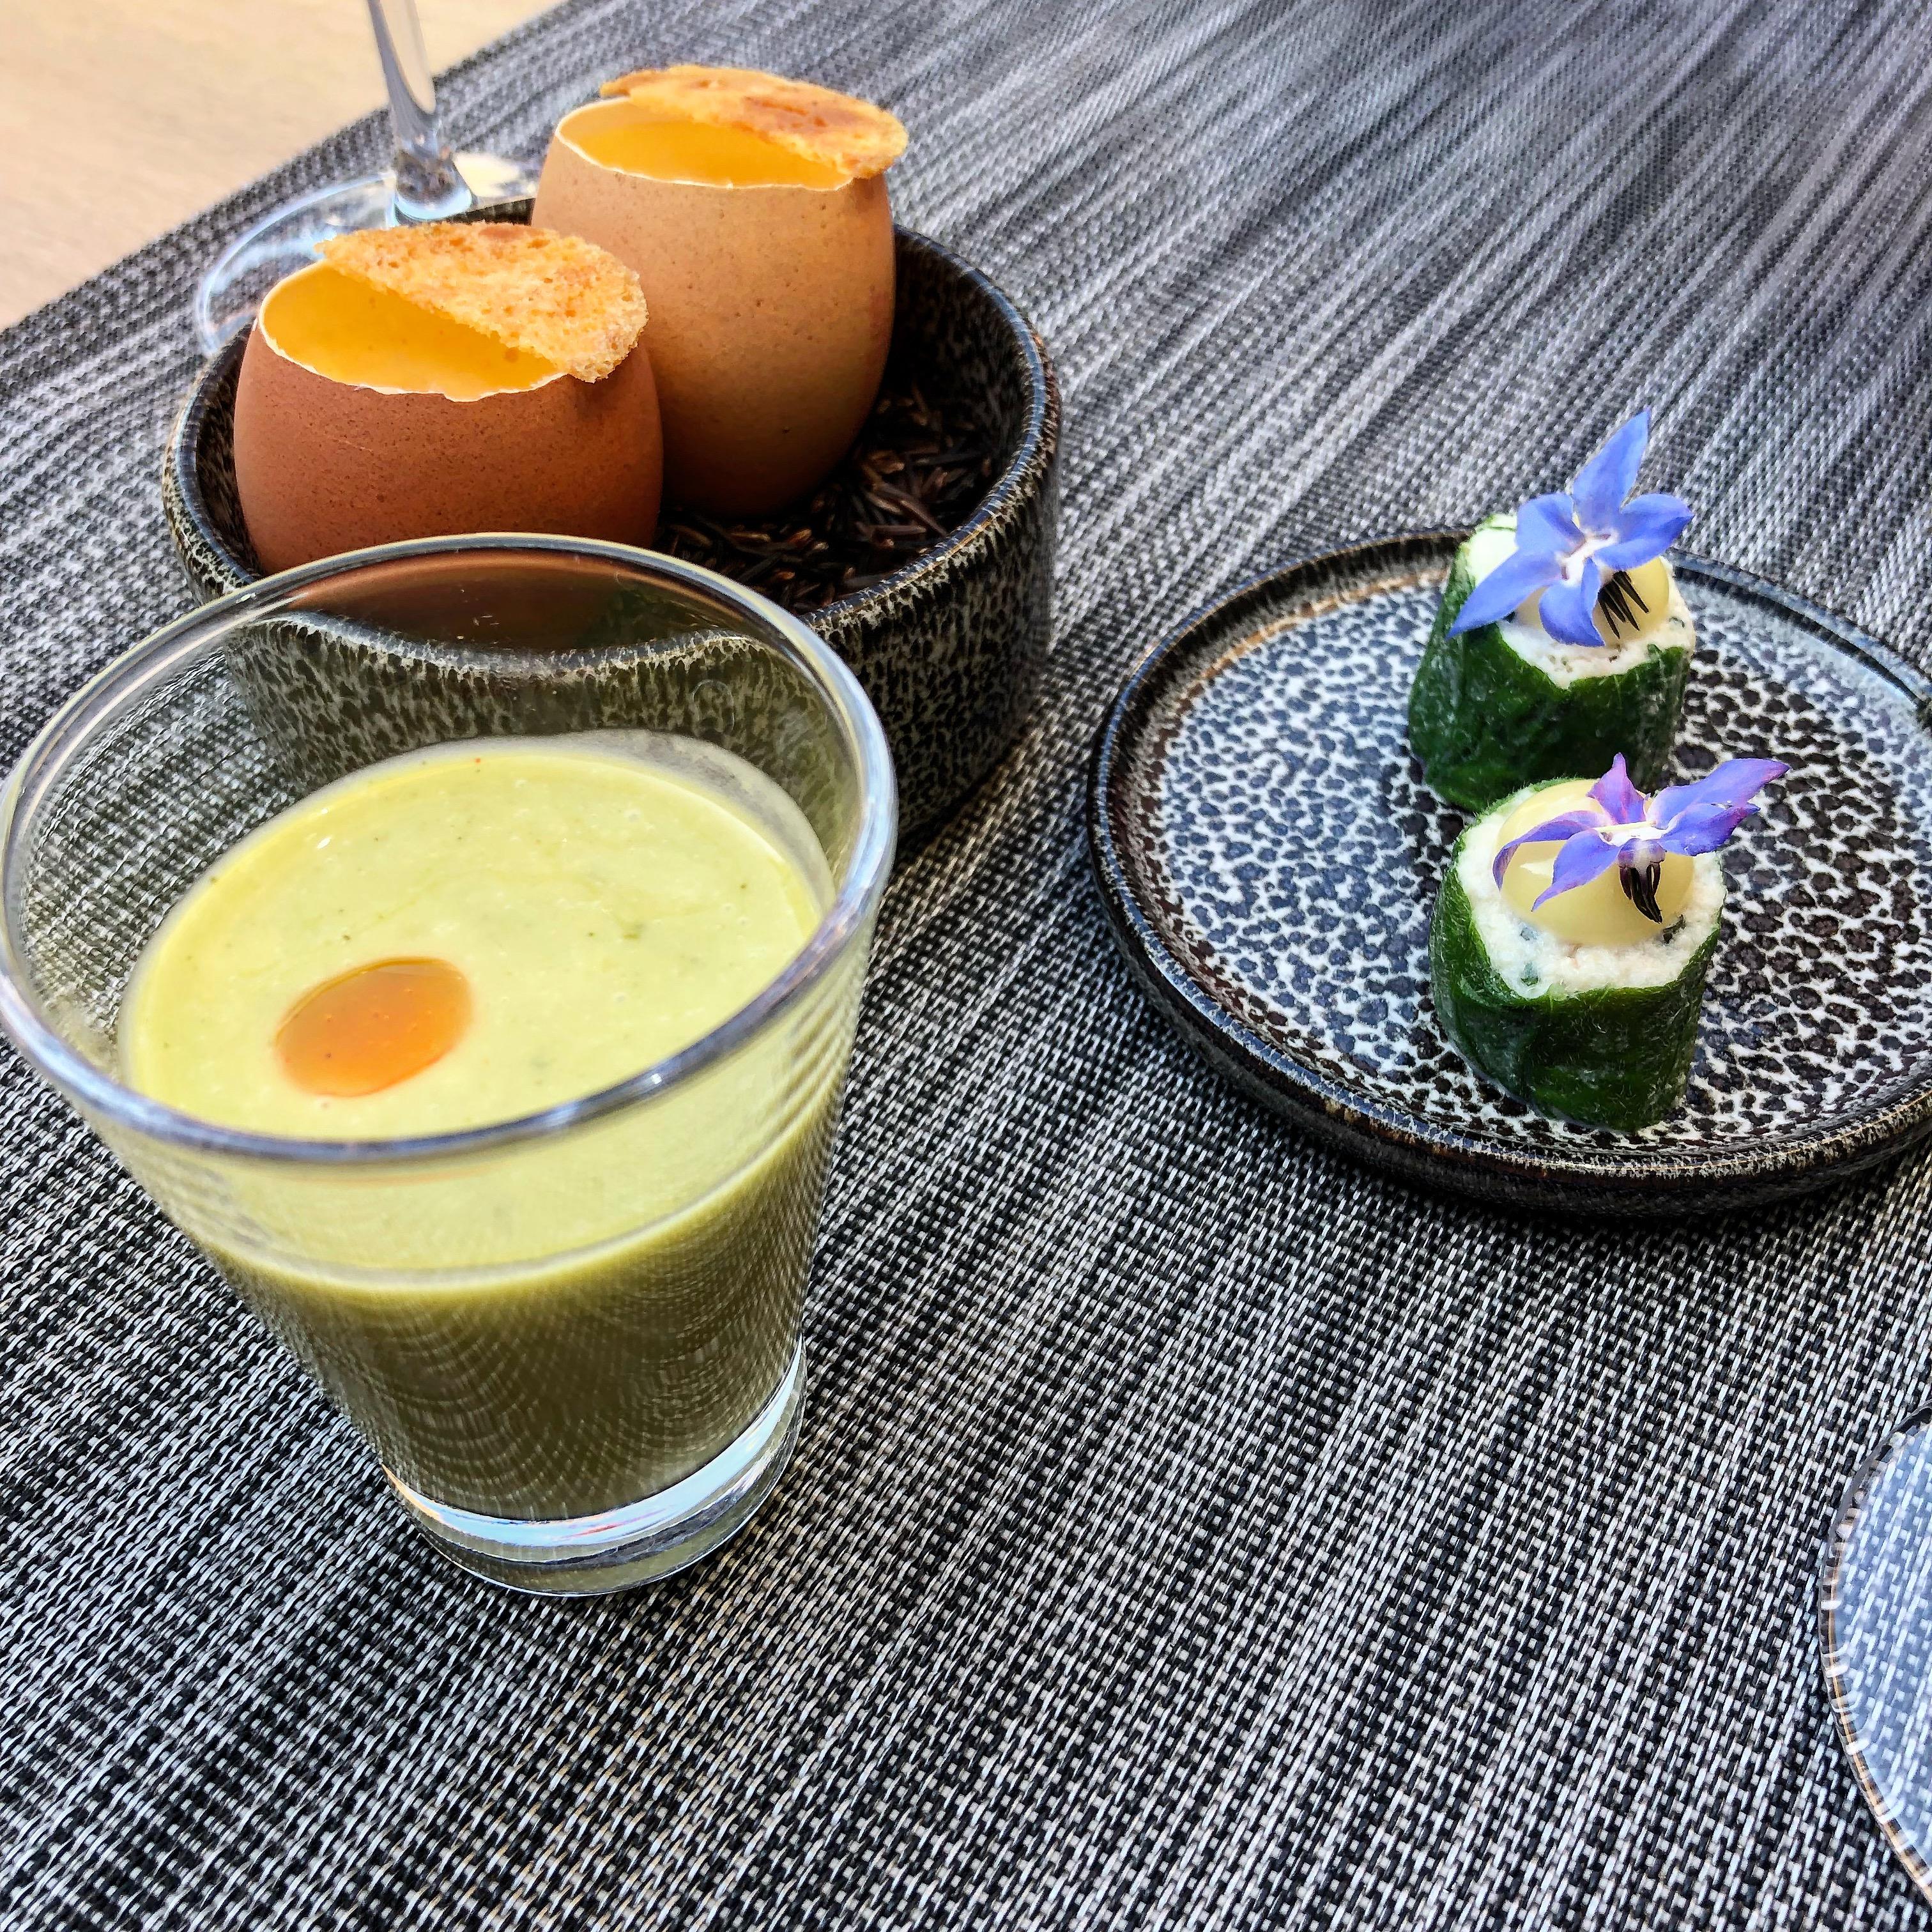 Mont-à-Gourmet